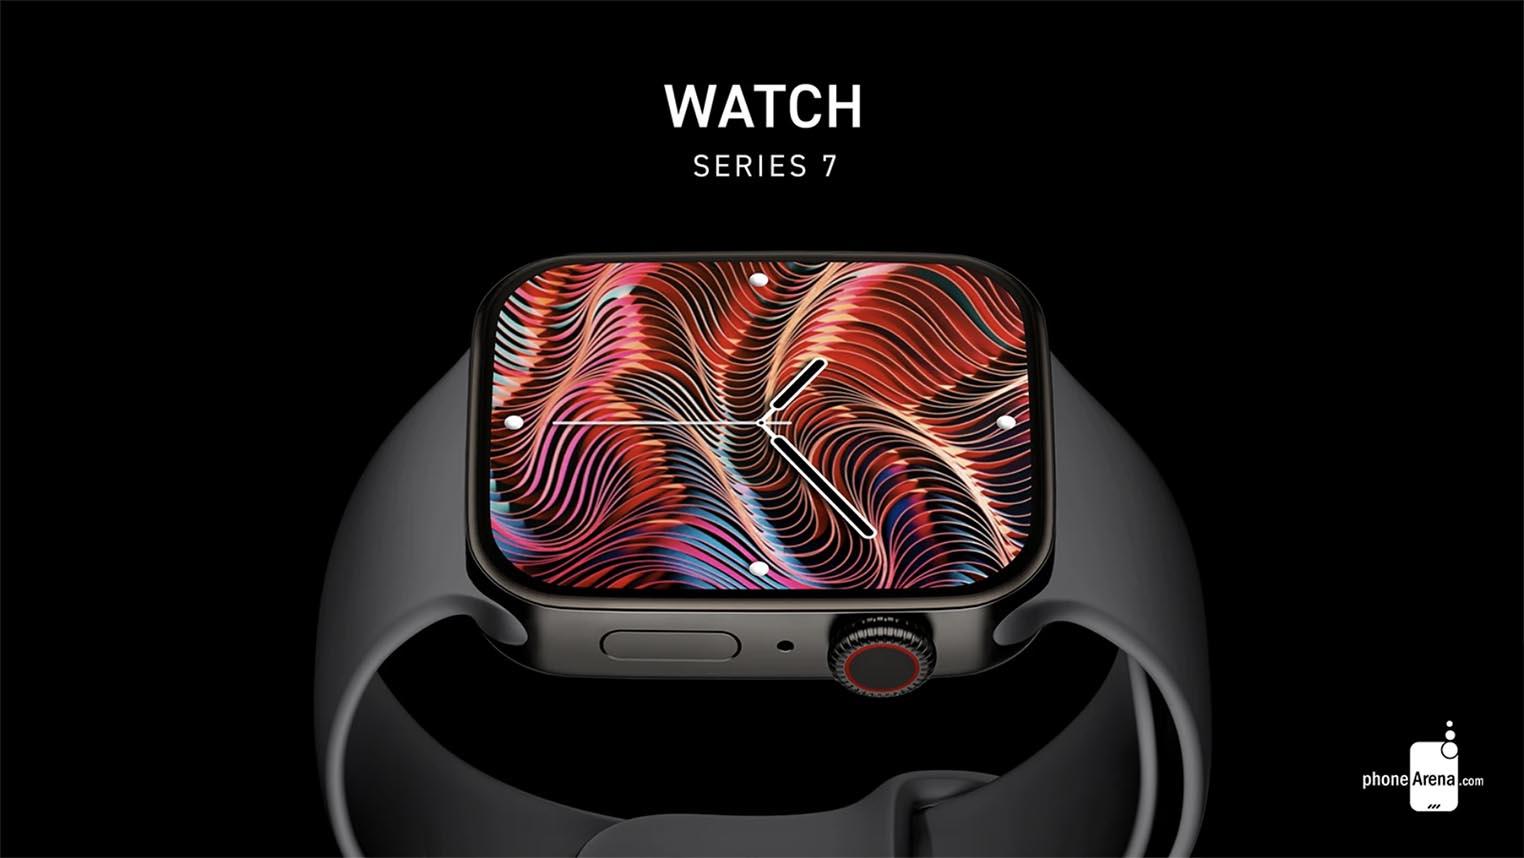 Concept Apple Watch Series 7